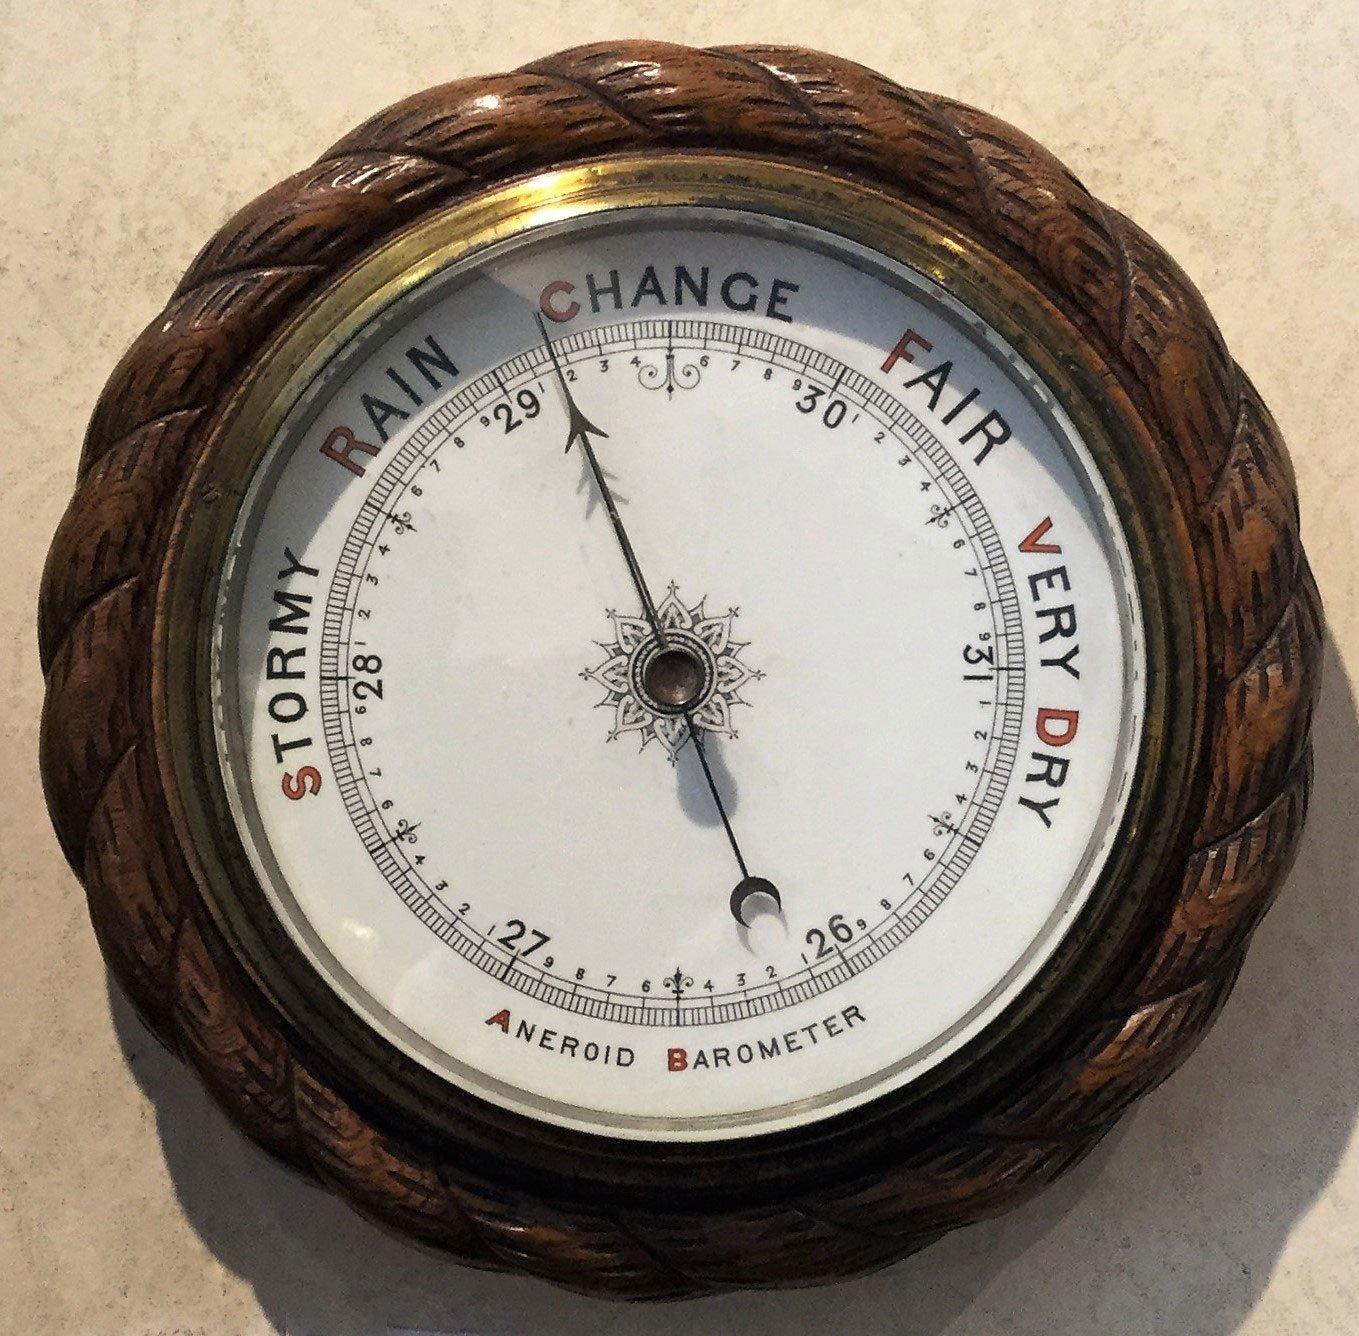 Aneroid wheel barometer